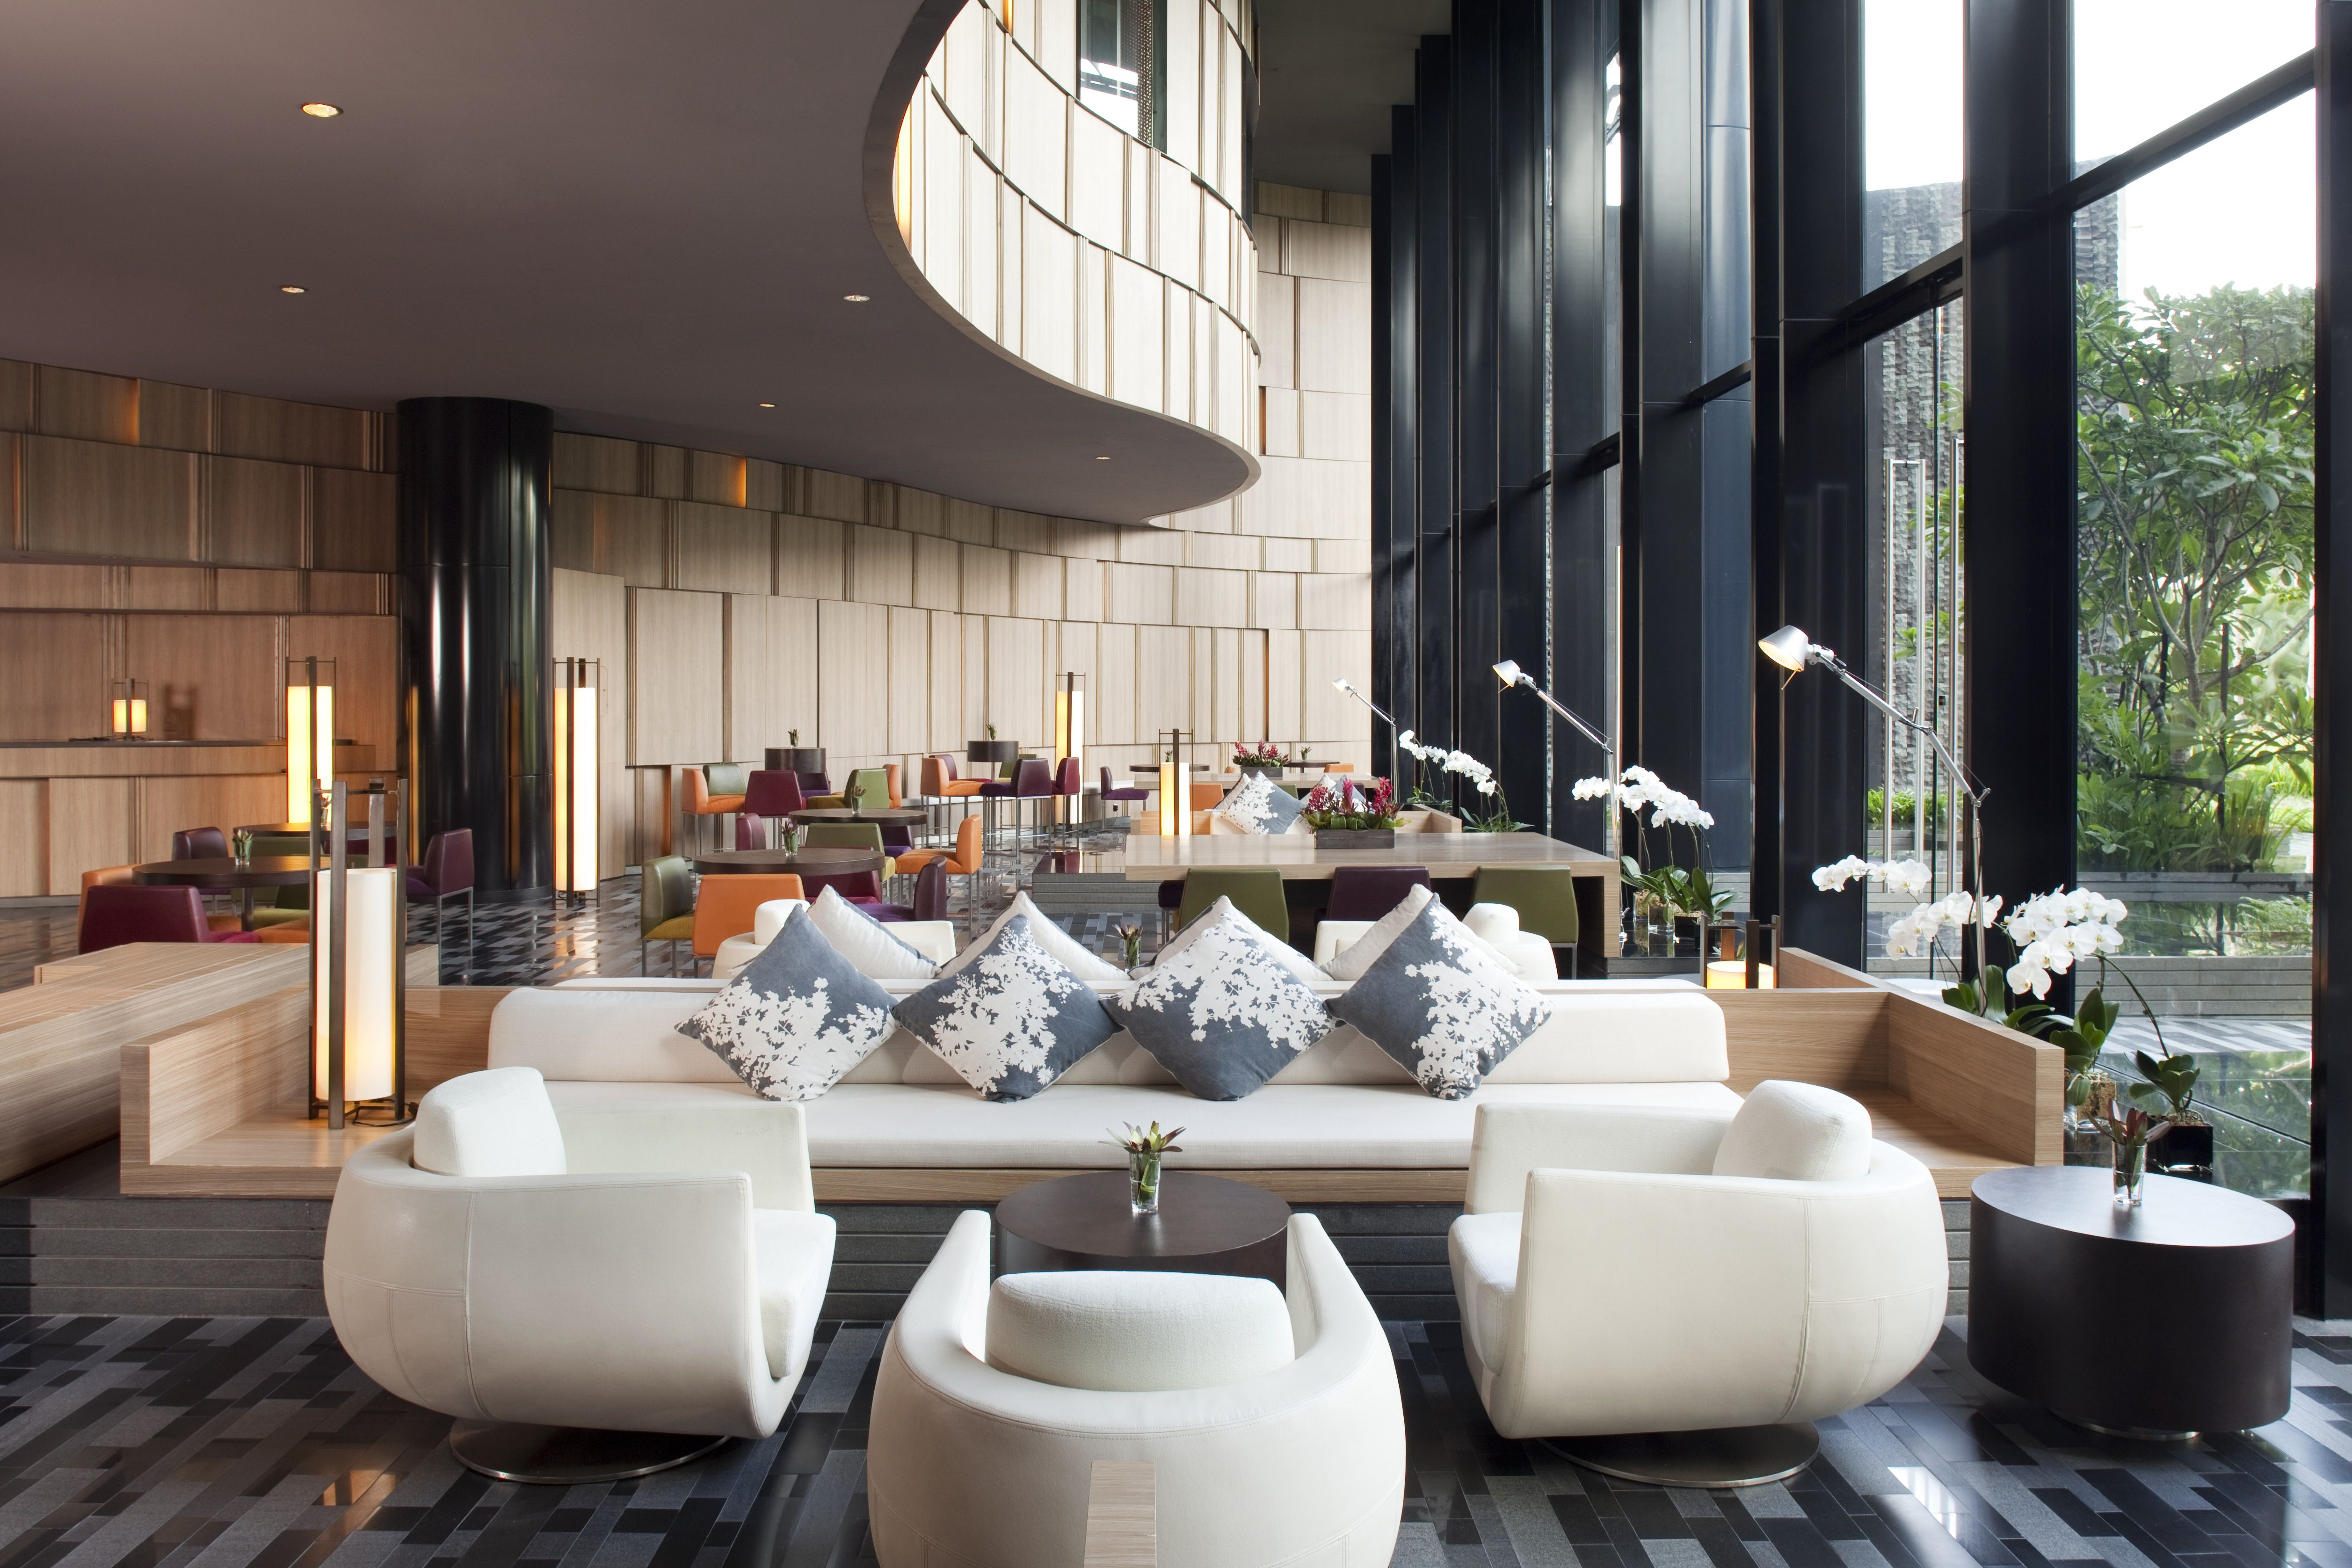 htl recliner sofa singapore glider moroso the lobby at crowne plaza changi has